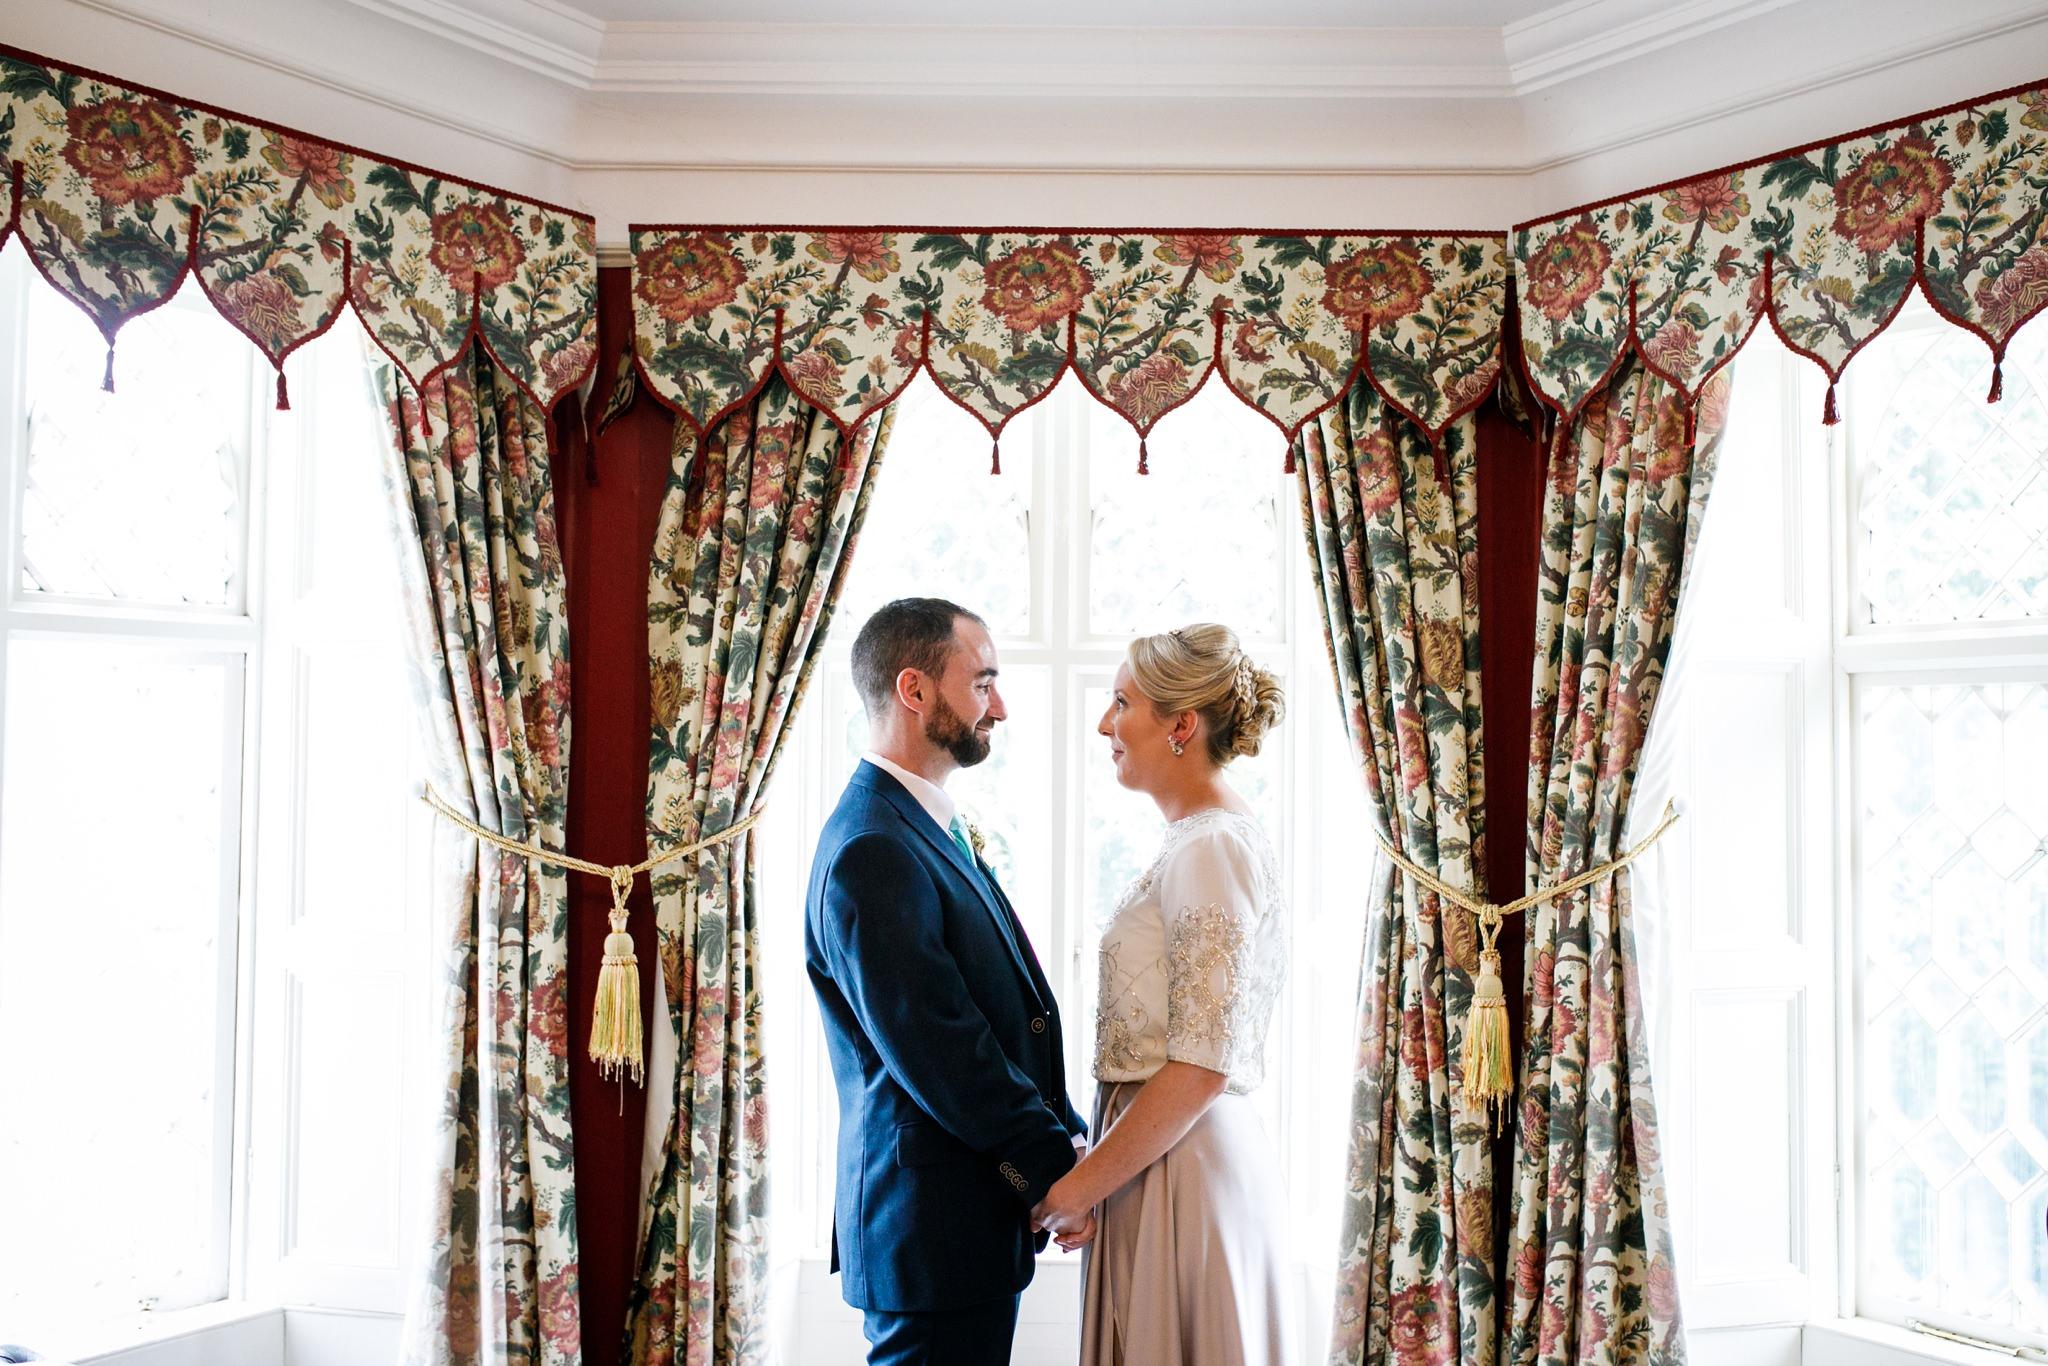 Elisha-Clarke-Photography-Dublin-City-Wedding_0063.jpg